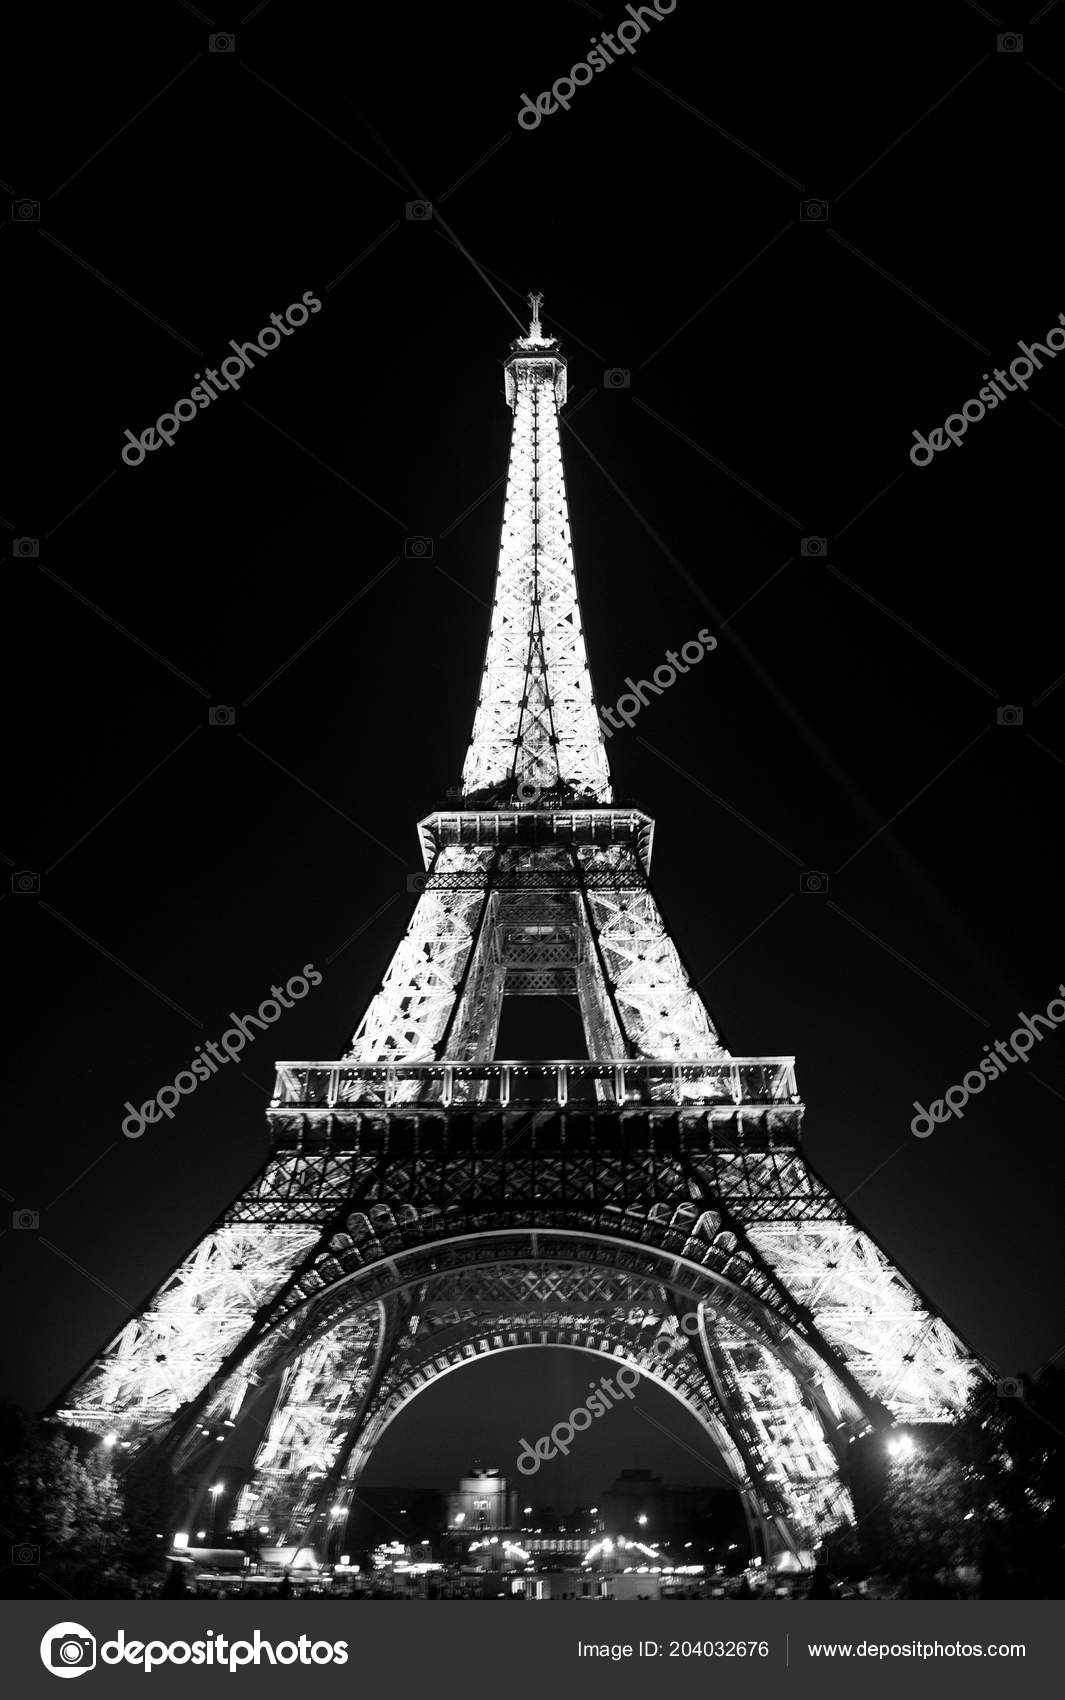 1 night in paris download